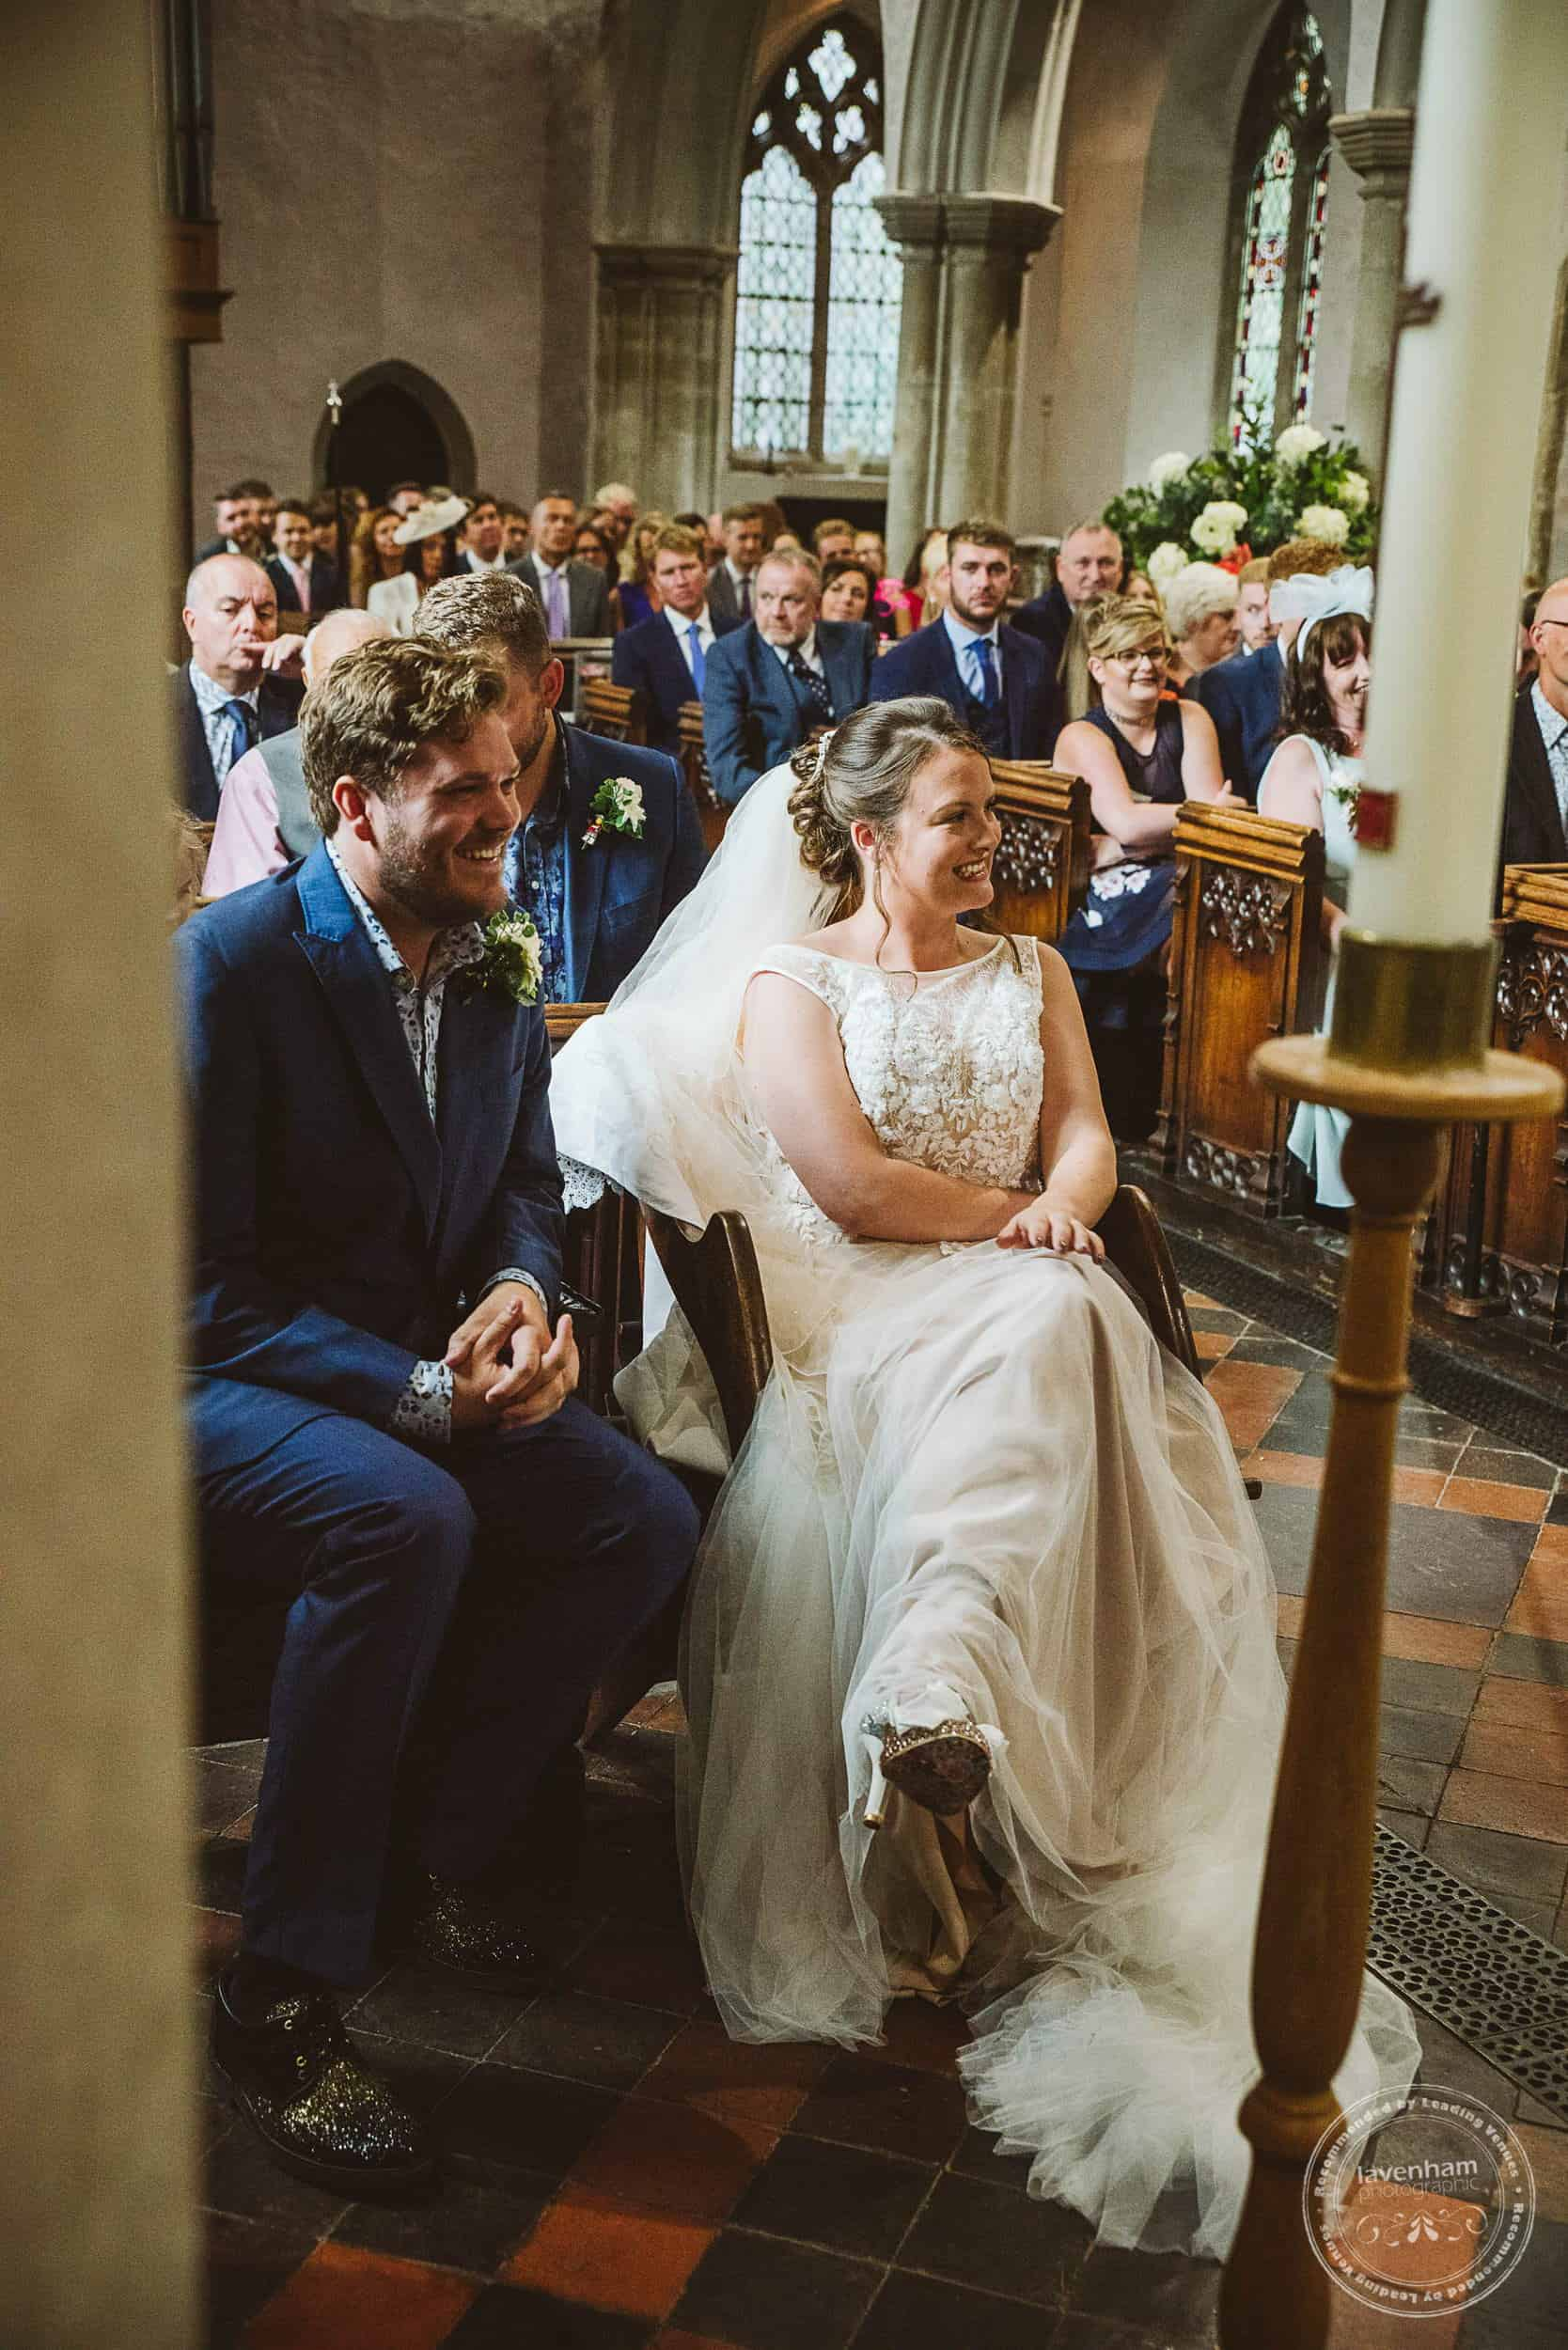 180818 Marks Hall Wedding Photography Lavenham Photographic 050